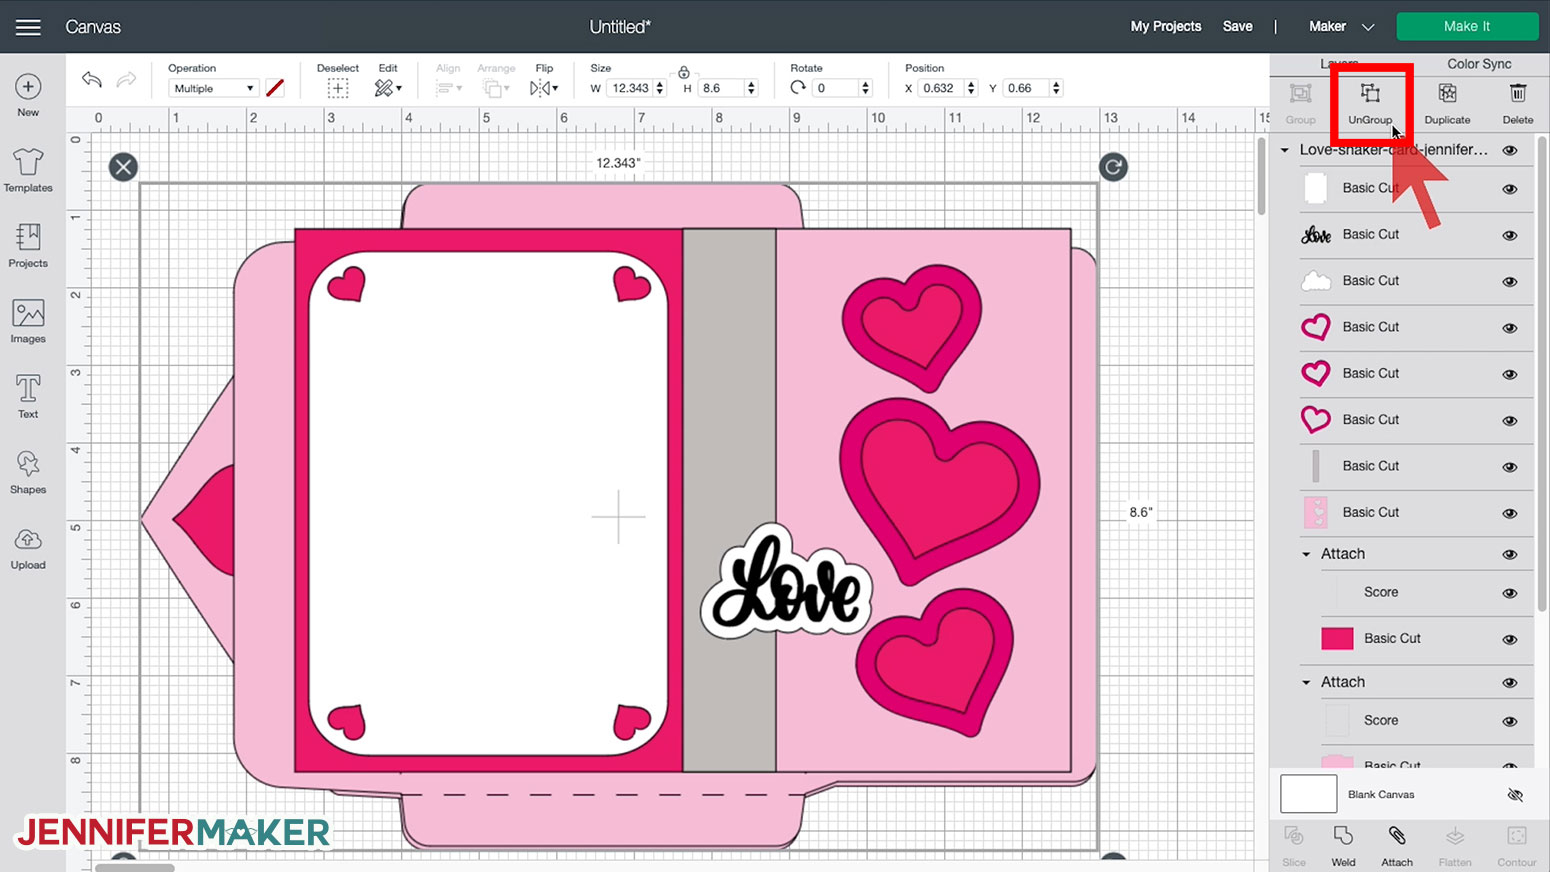 Shaker Card svg cut file uploaded to Cricut Design Space